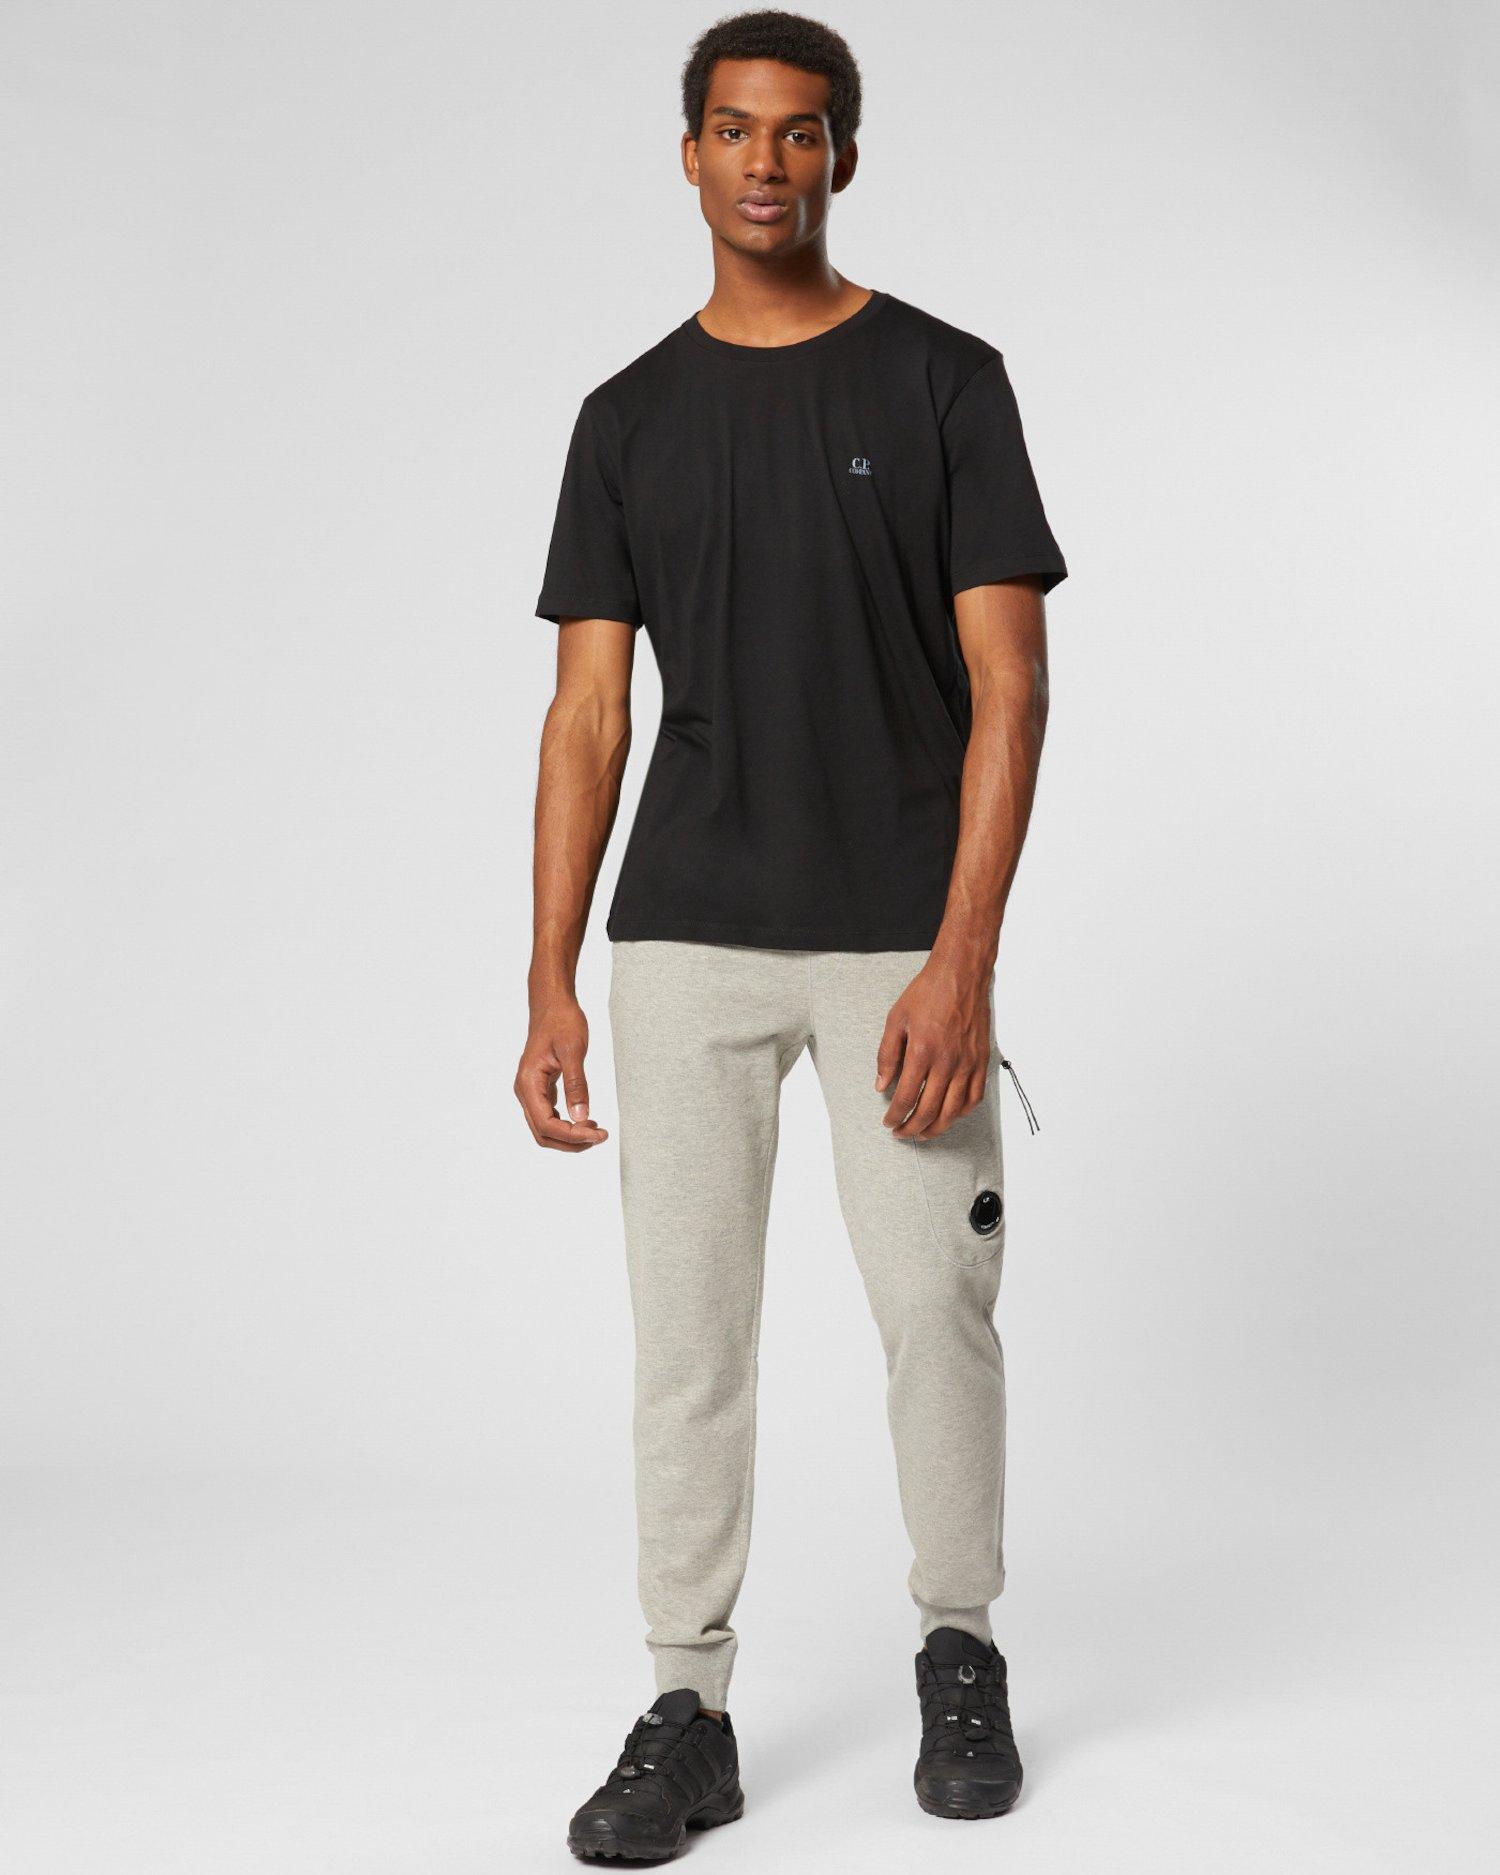 Jersey 30/1 Goggle Print T-Shirt